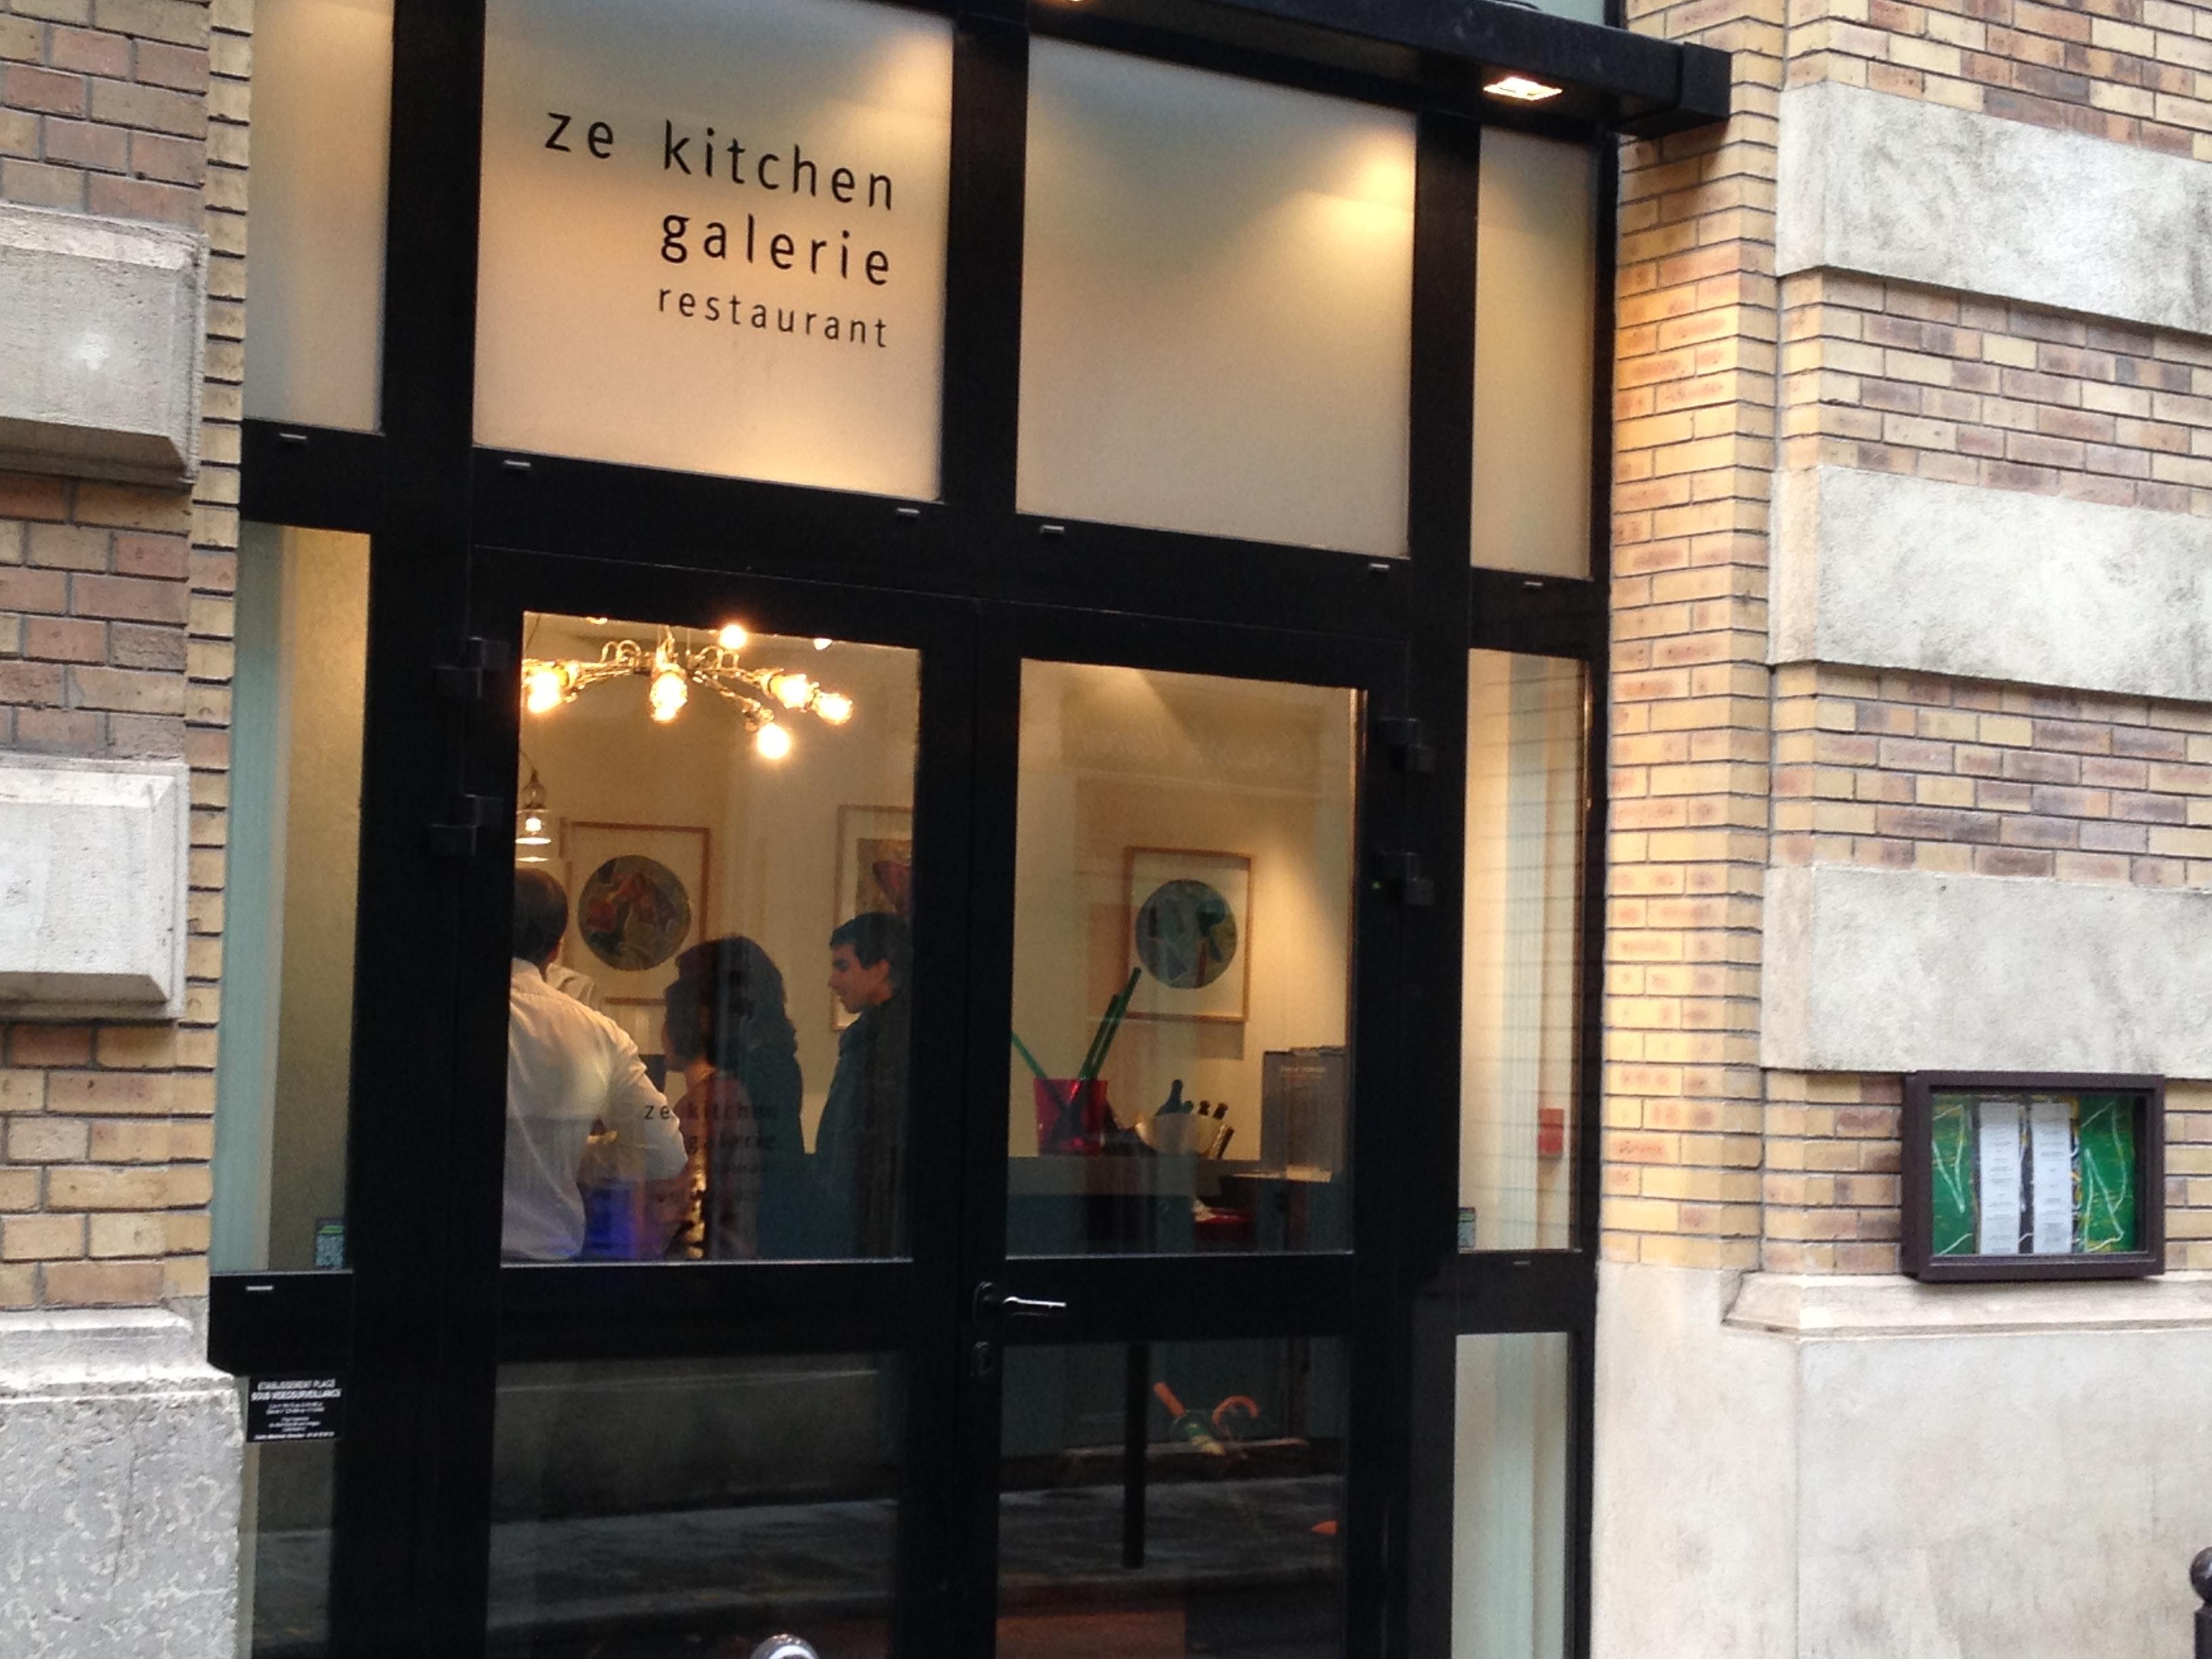 Ze kitchen galerie william ledeuil paris frankreich for Ze kitchen galerie paris france